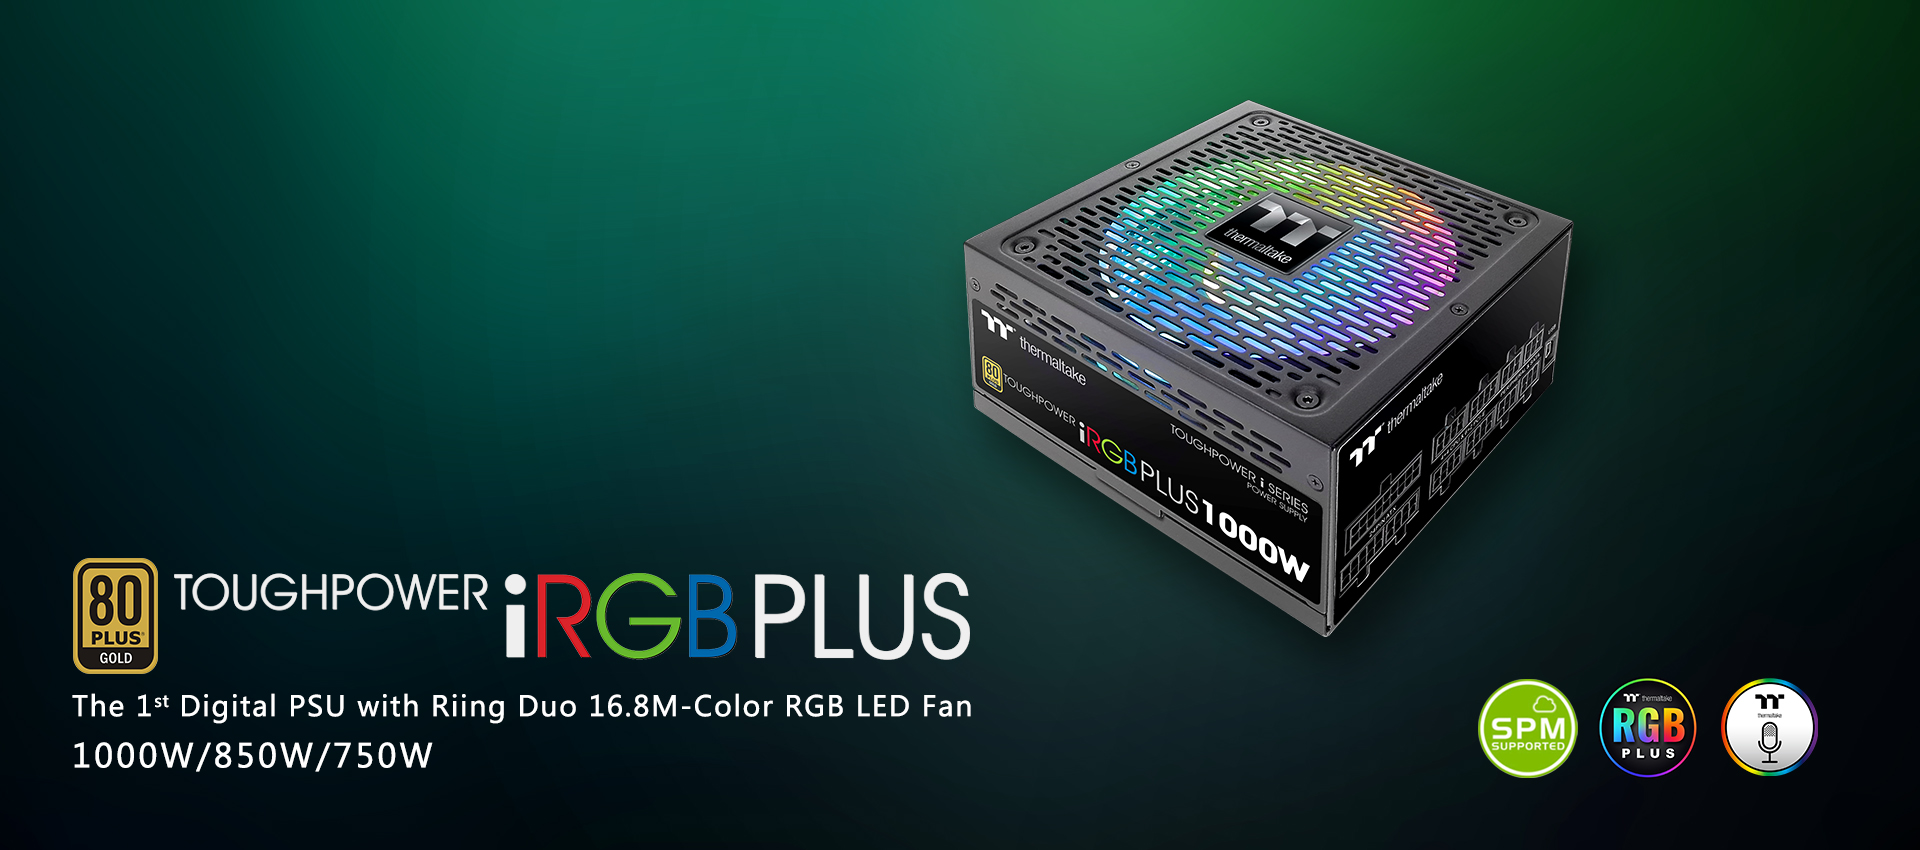 Toughpower iRGB PLUS 1000W Gold - TT Premium Edition